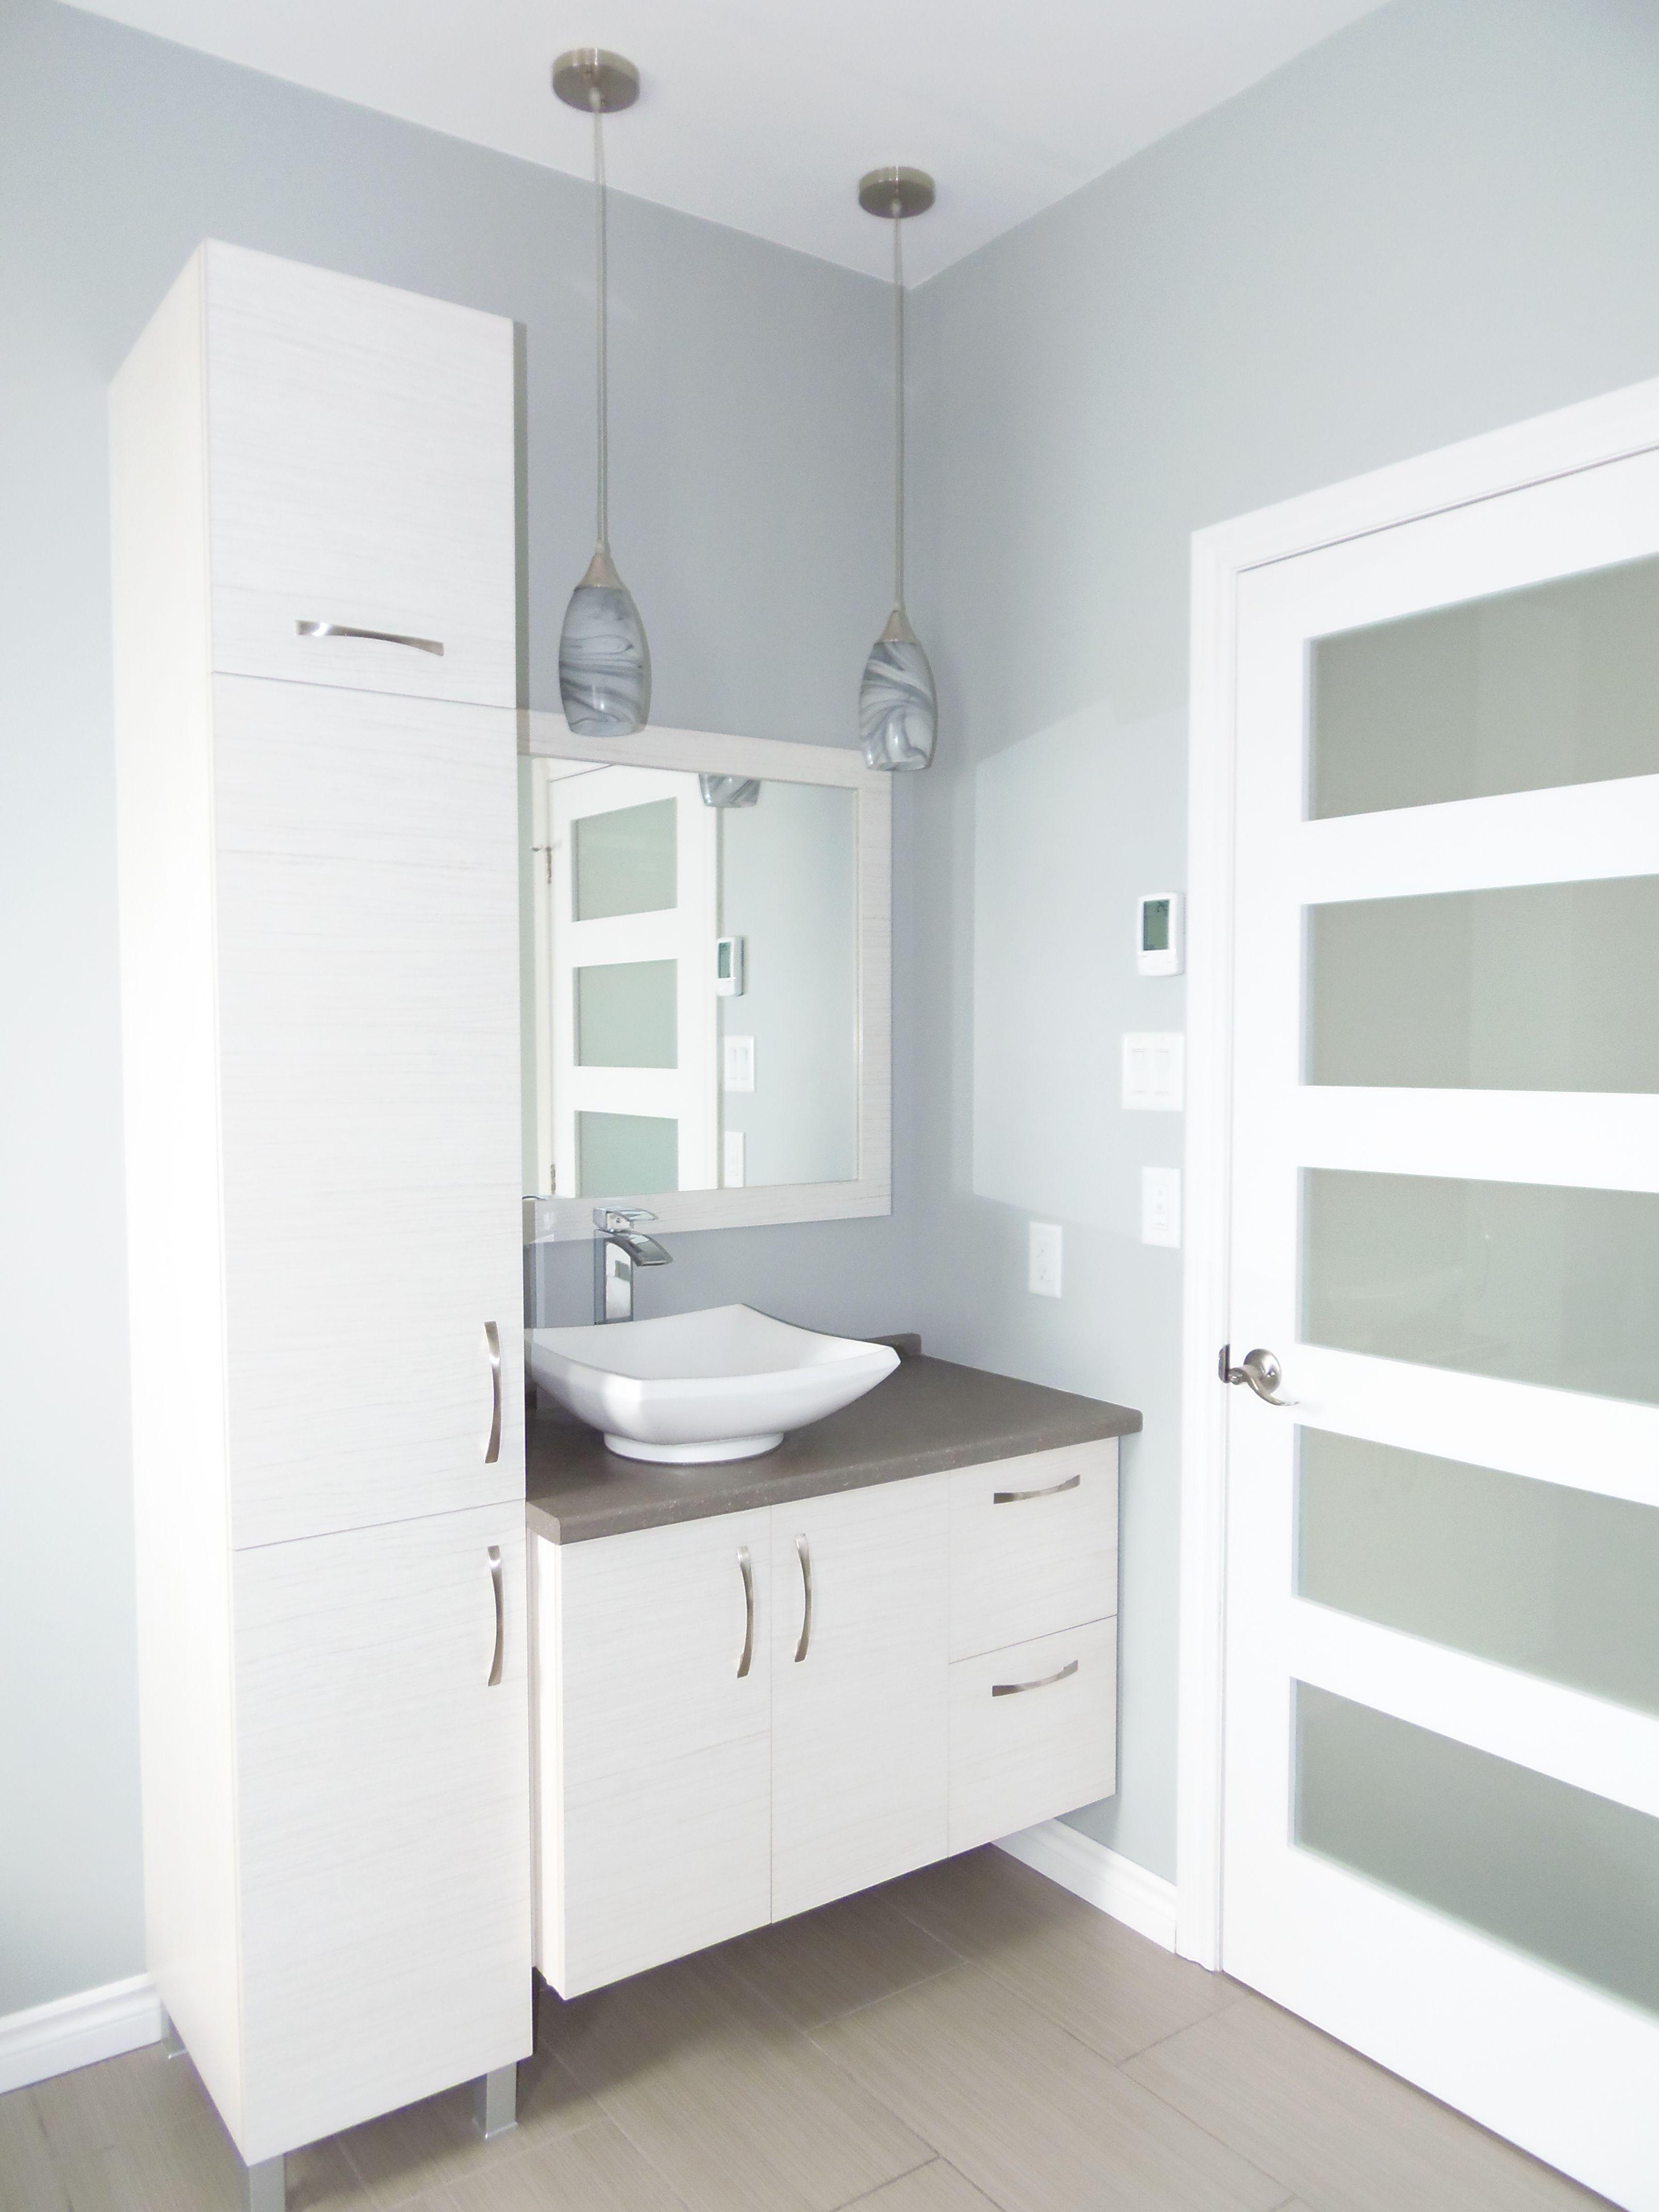 salle de bain contemporaine salle de bain en 2019. Black Bedroom Furniture Sets. Home Design Ideas